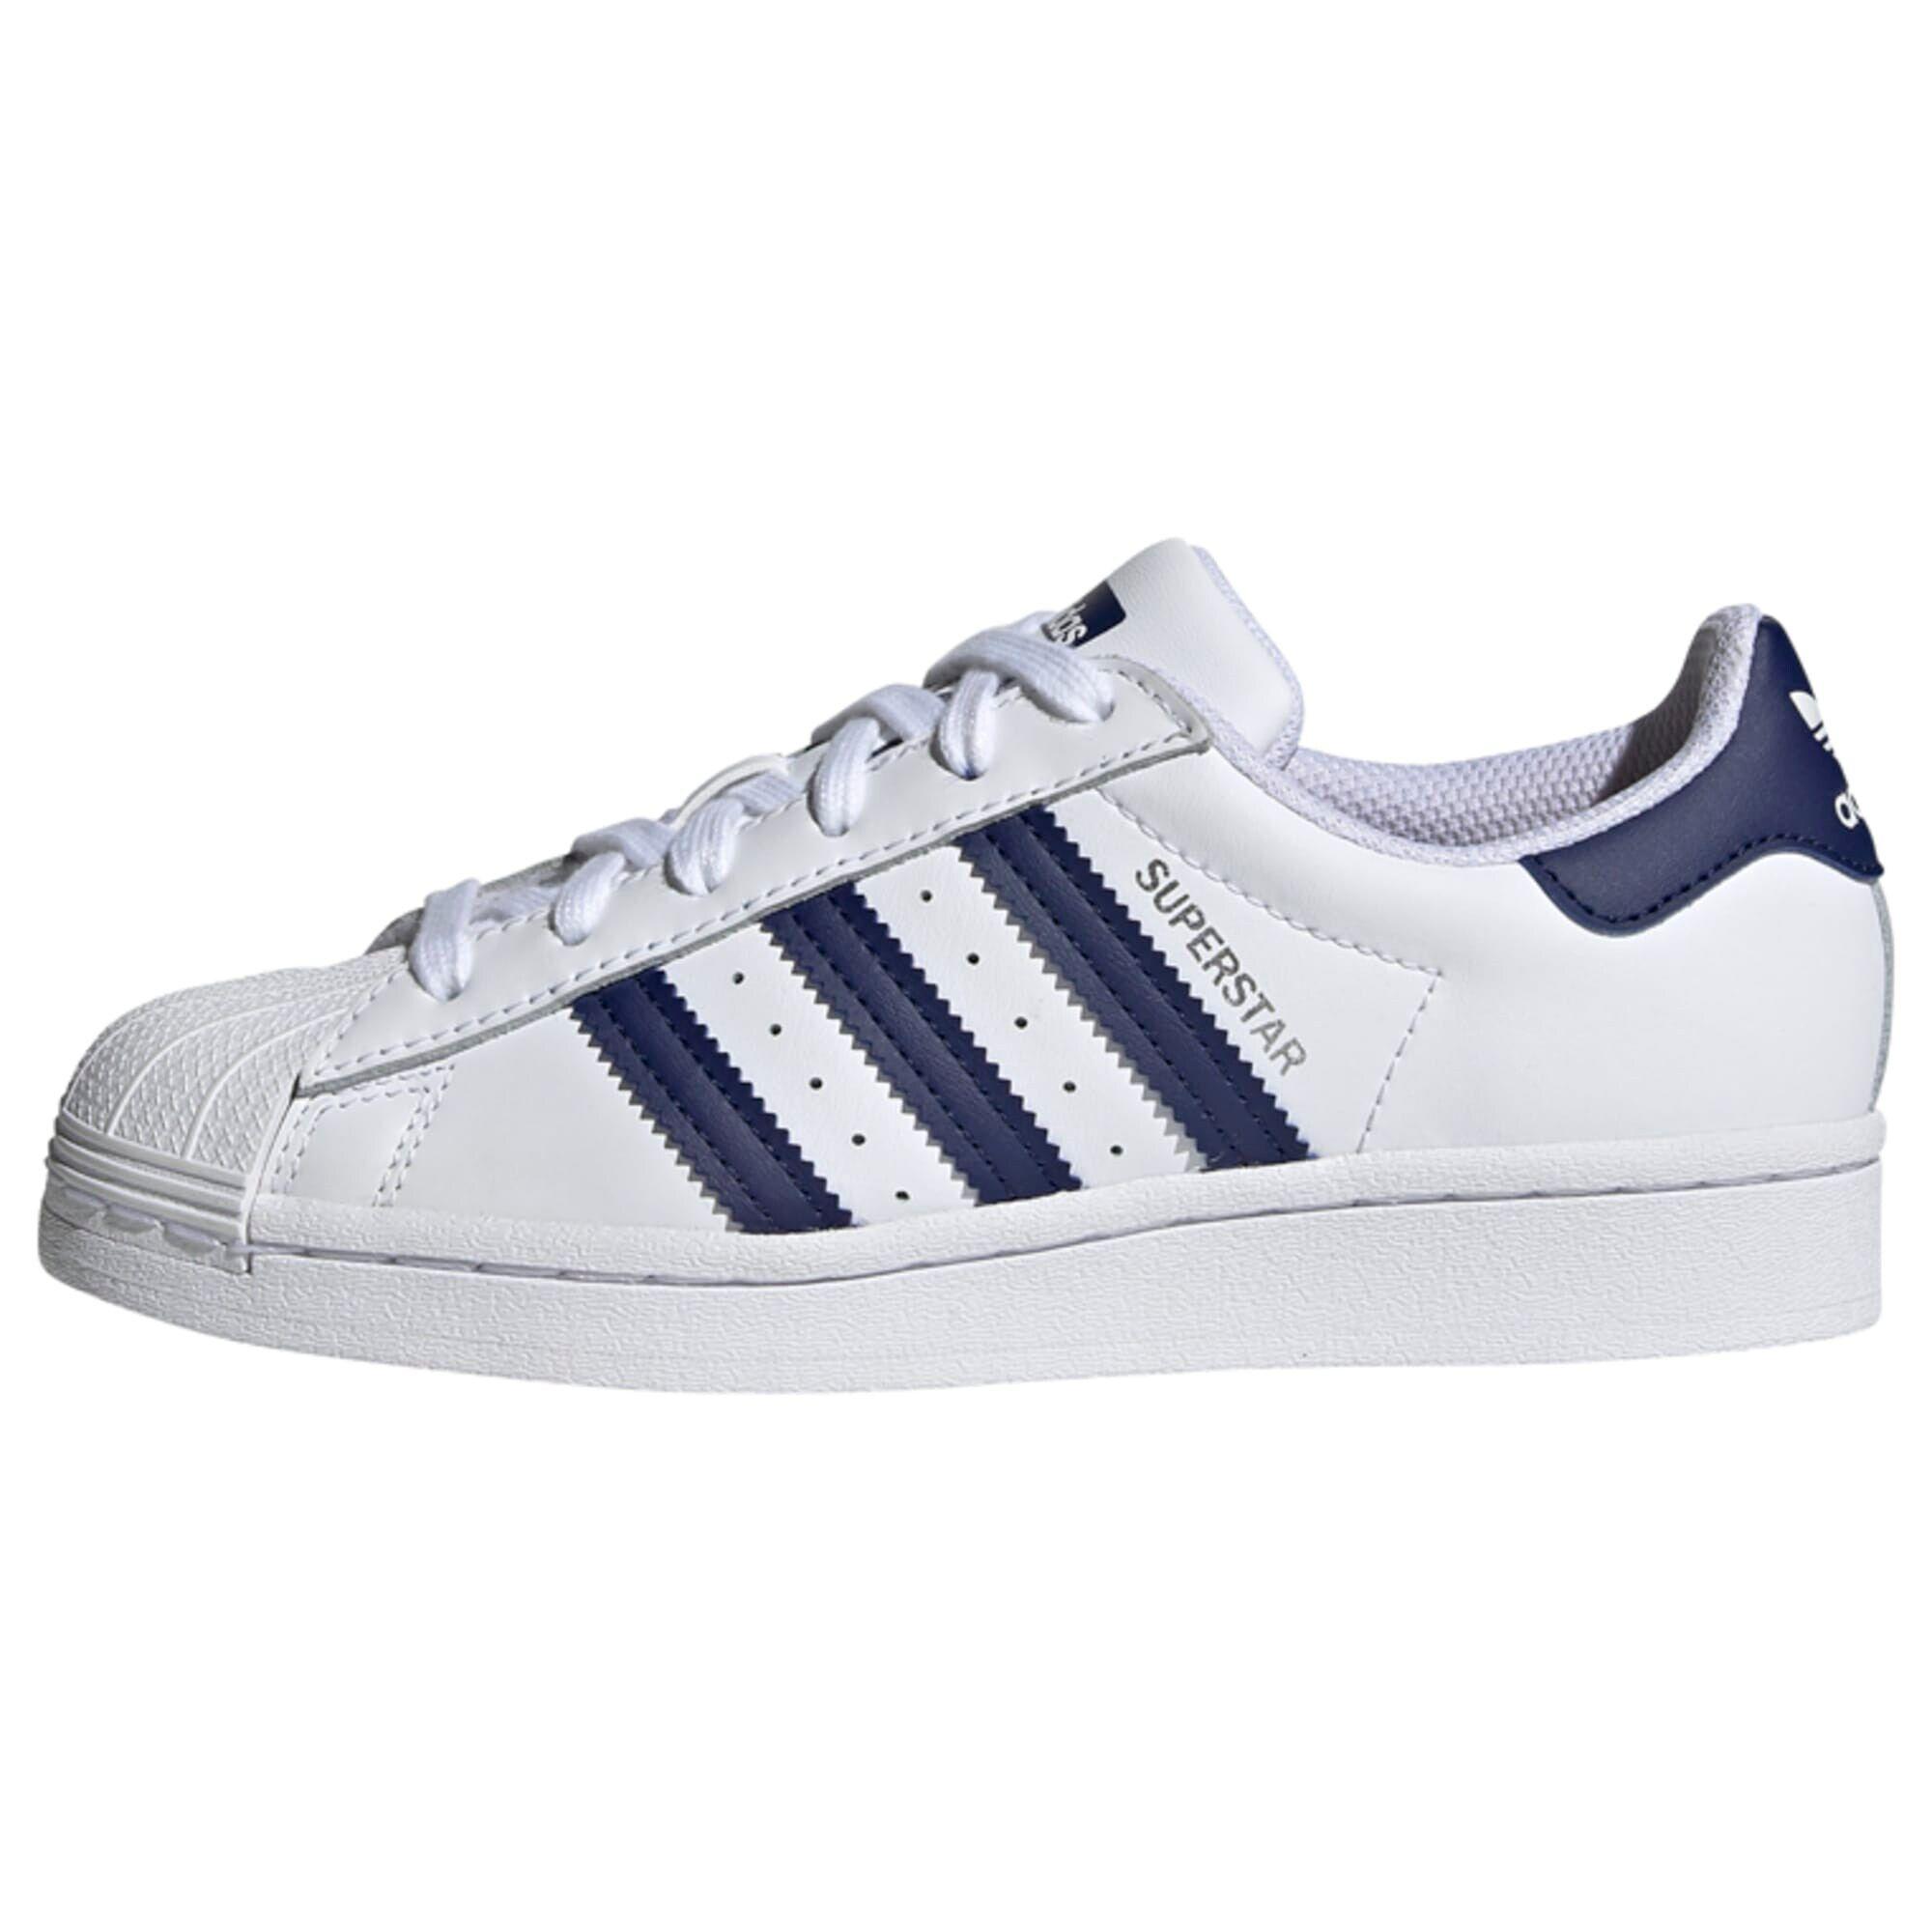 ADIDAS ORIGINALS Sneaker 'Superstar' Bianco